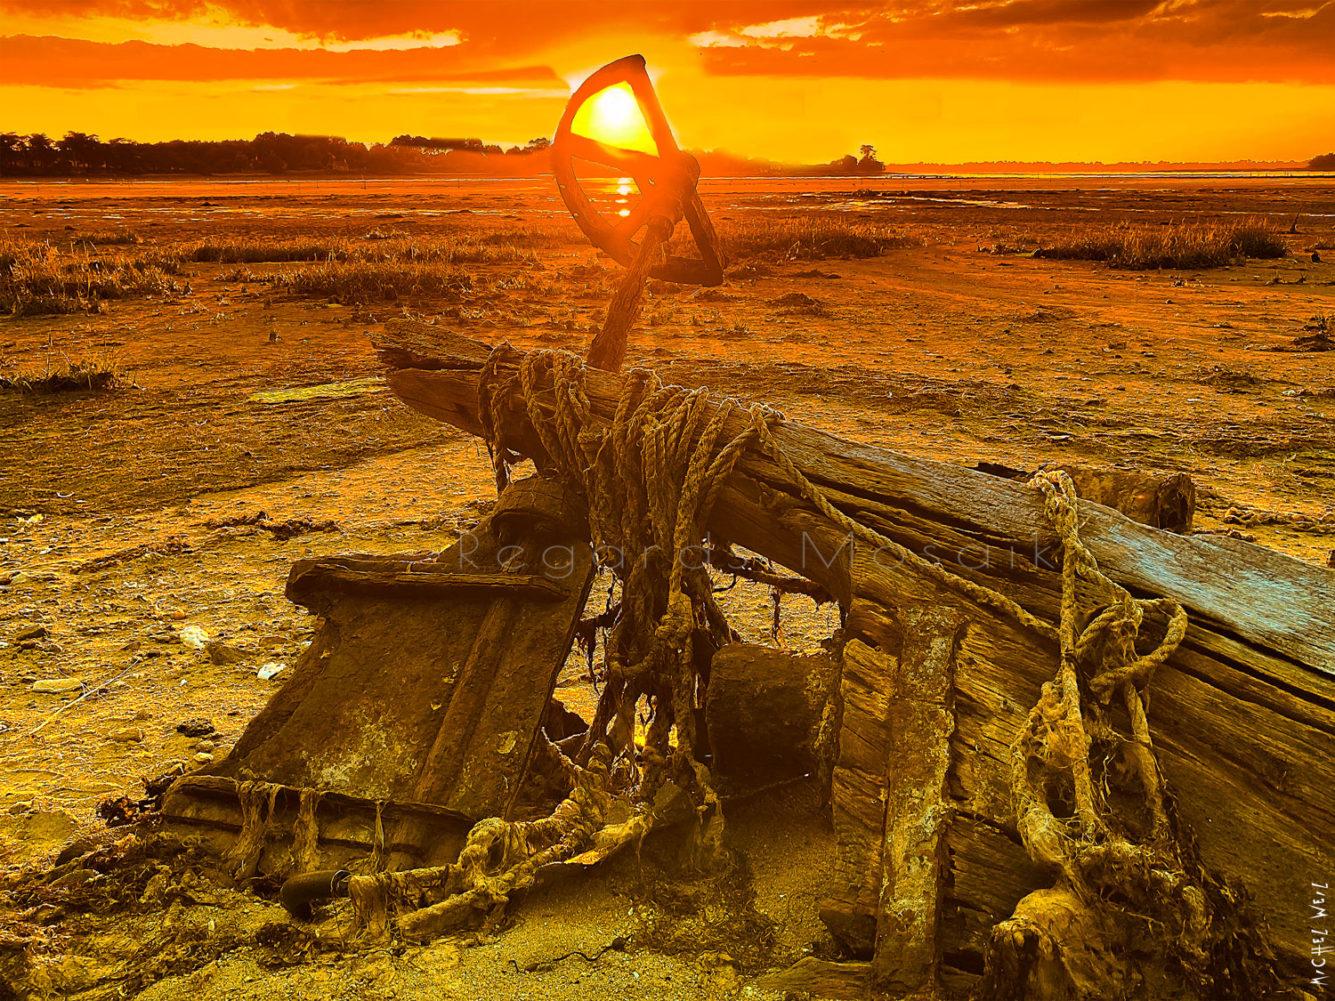 Wreck at Sunset